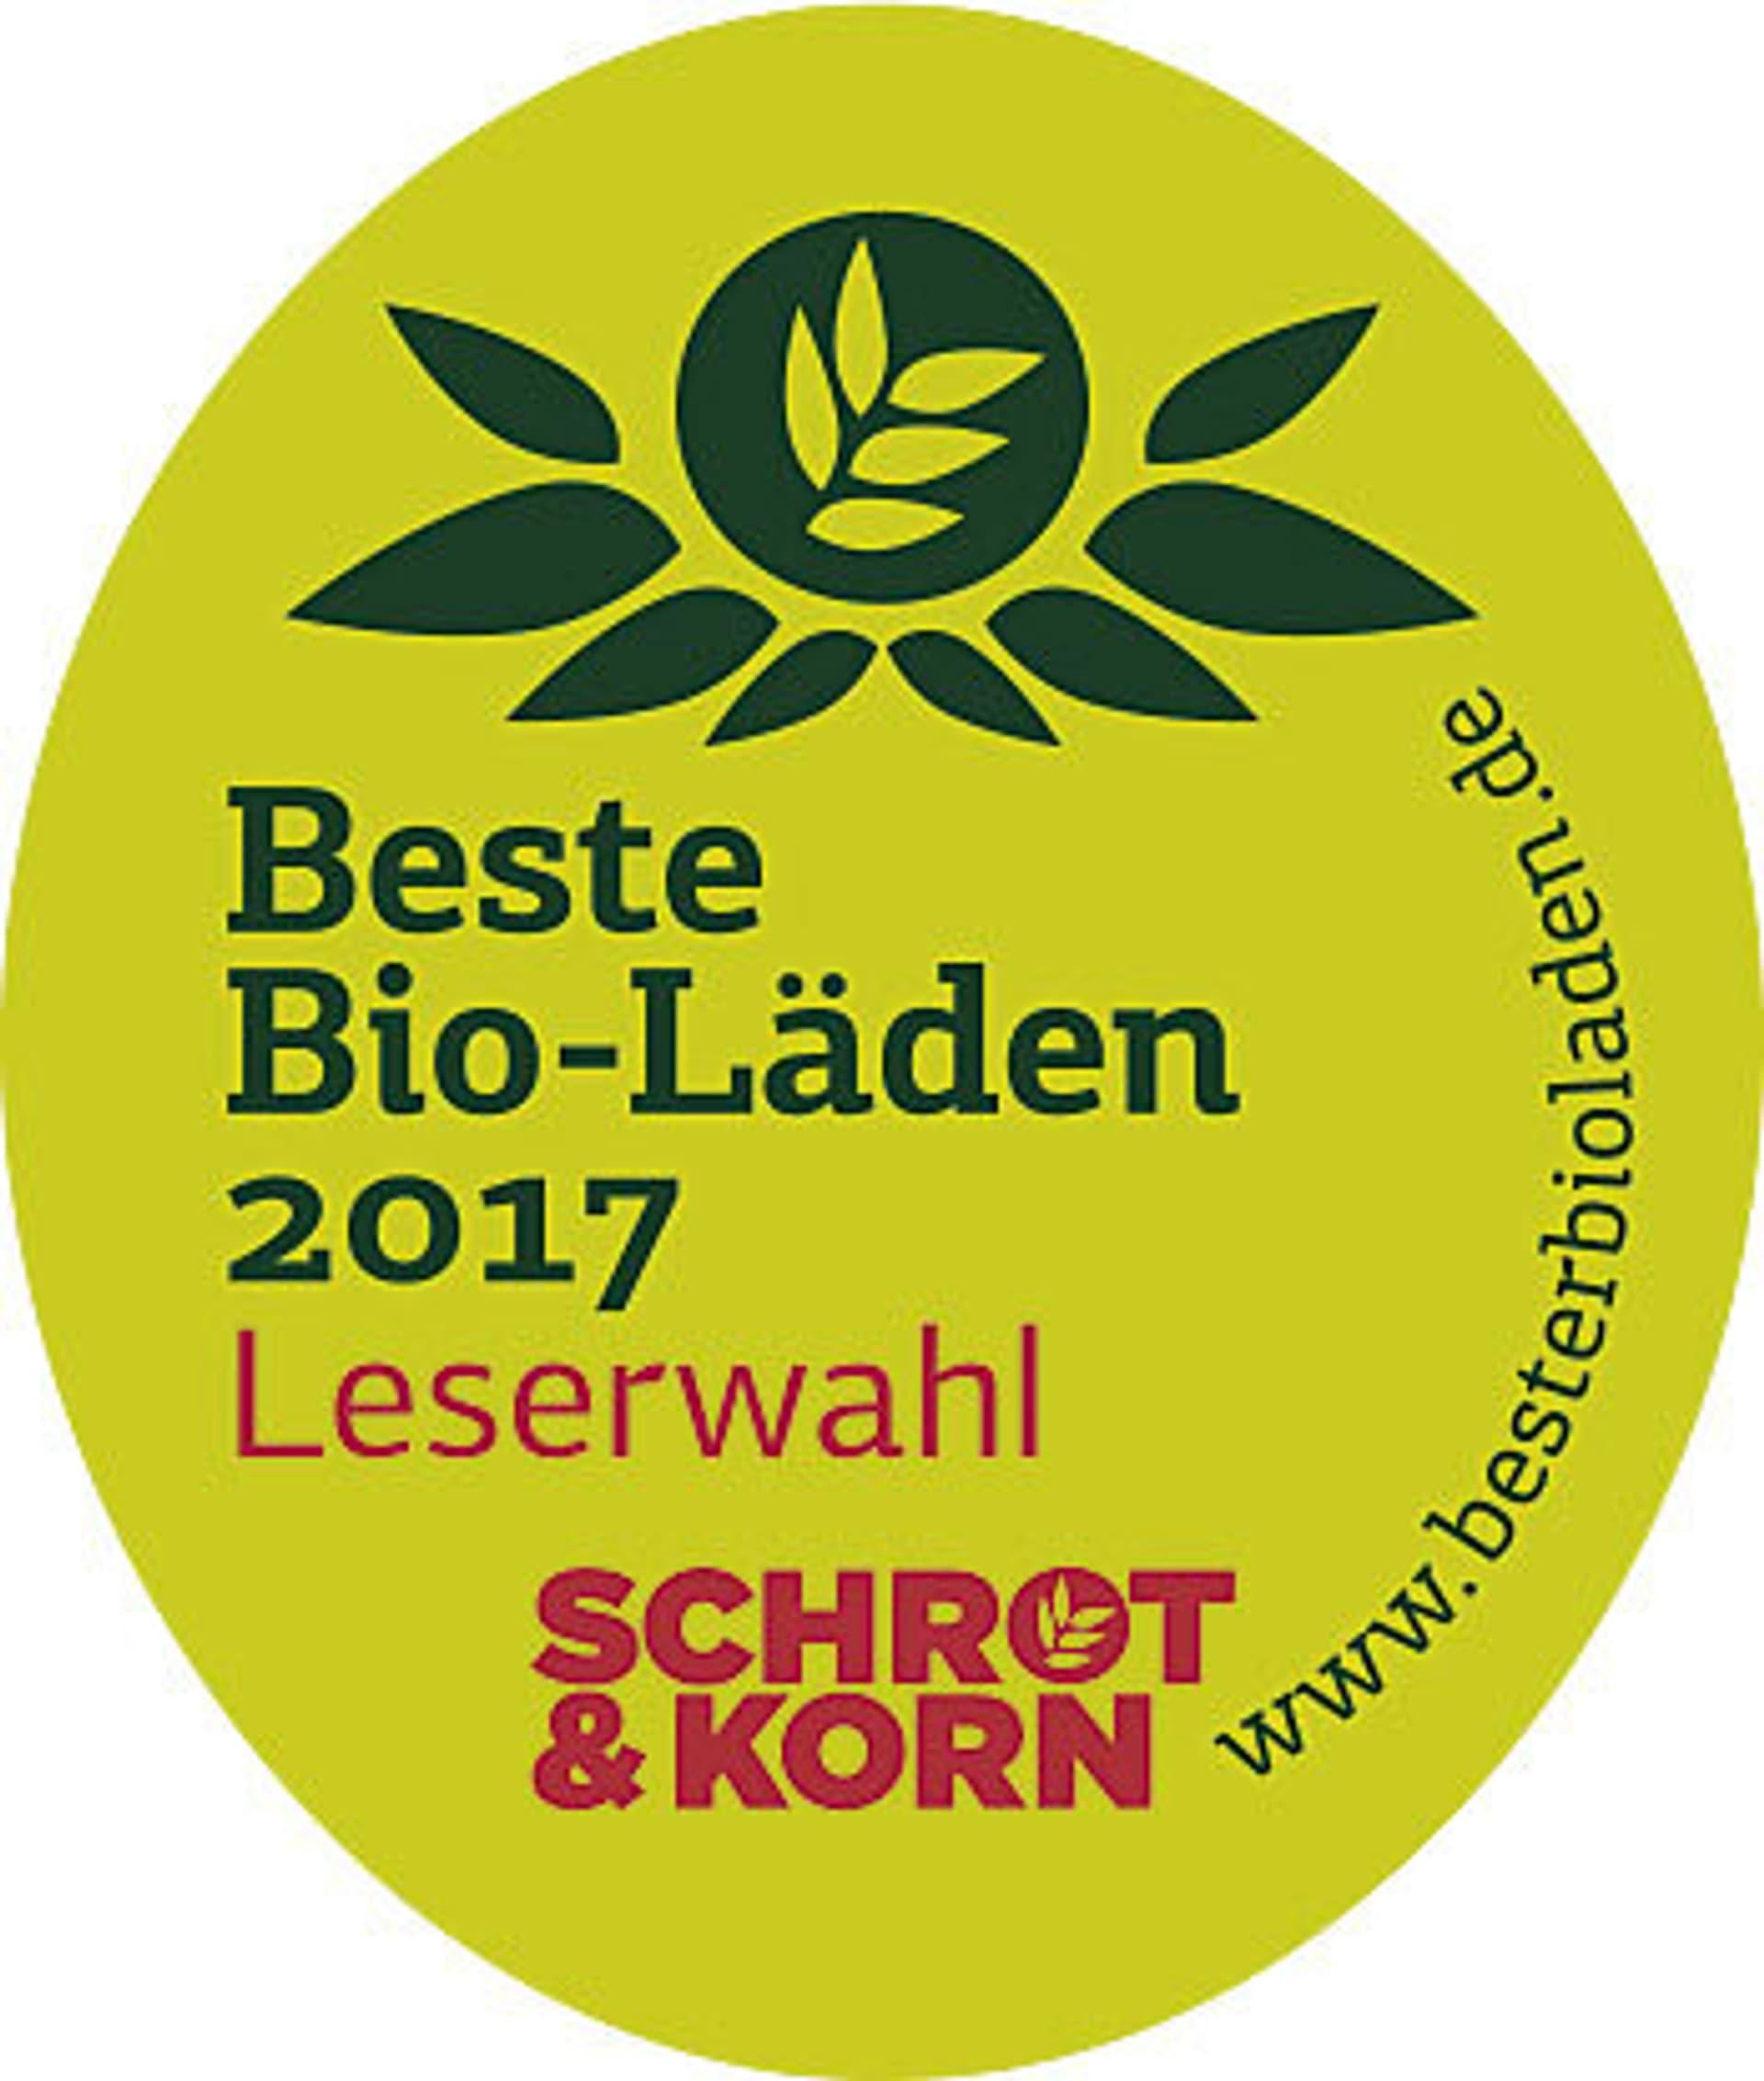 Bester Bio-Laden 2017 Logo